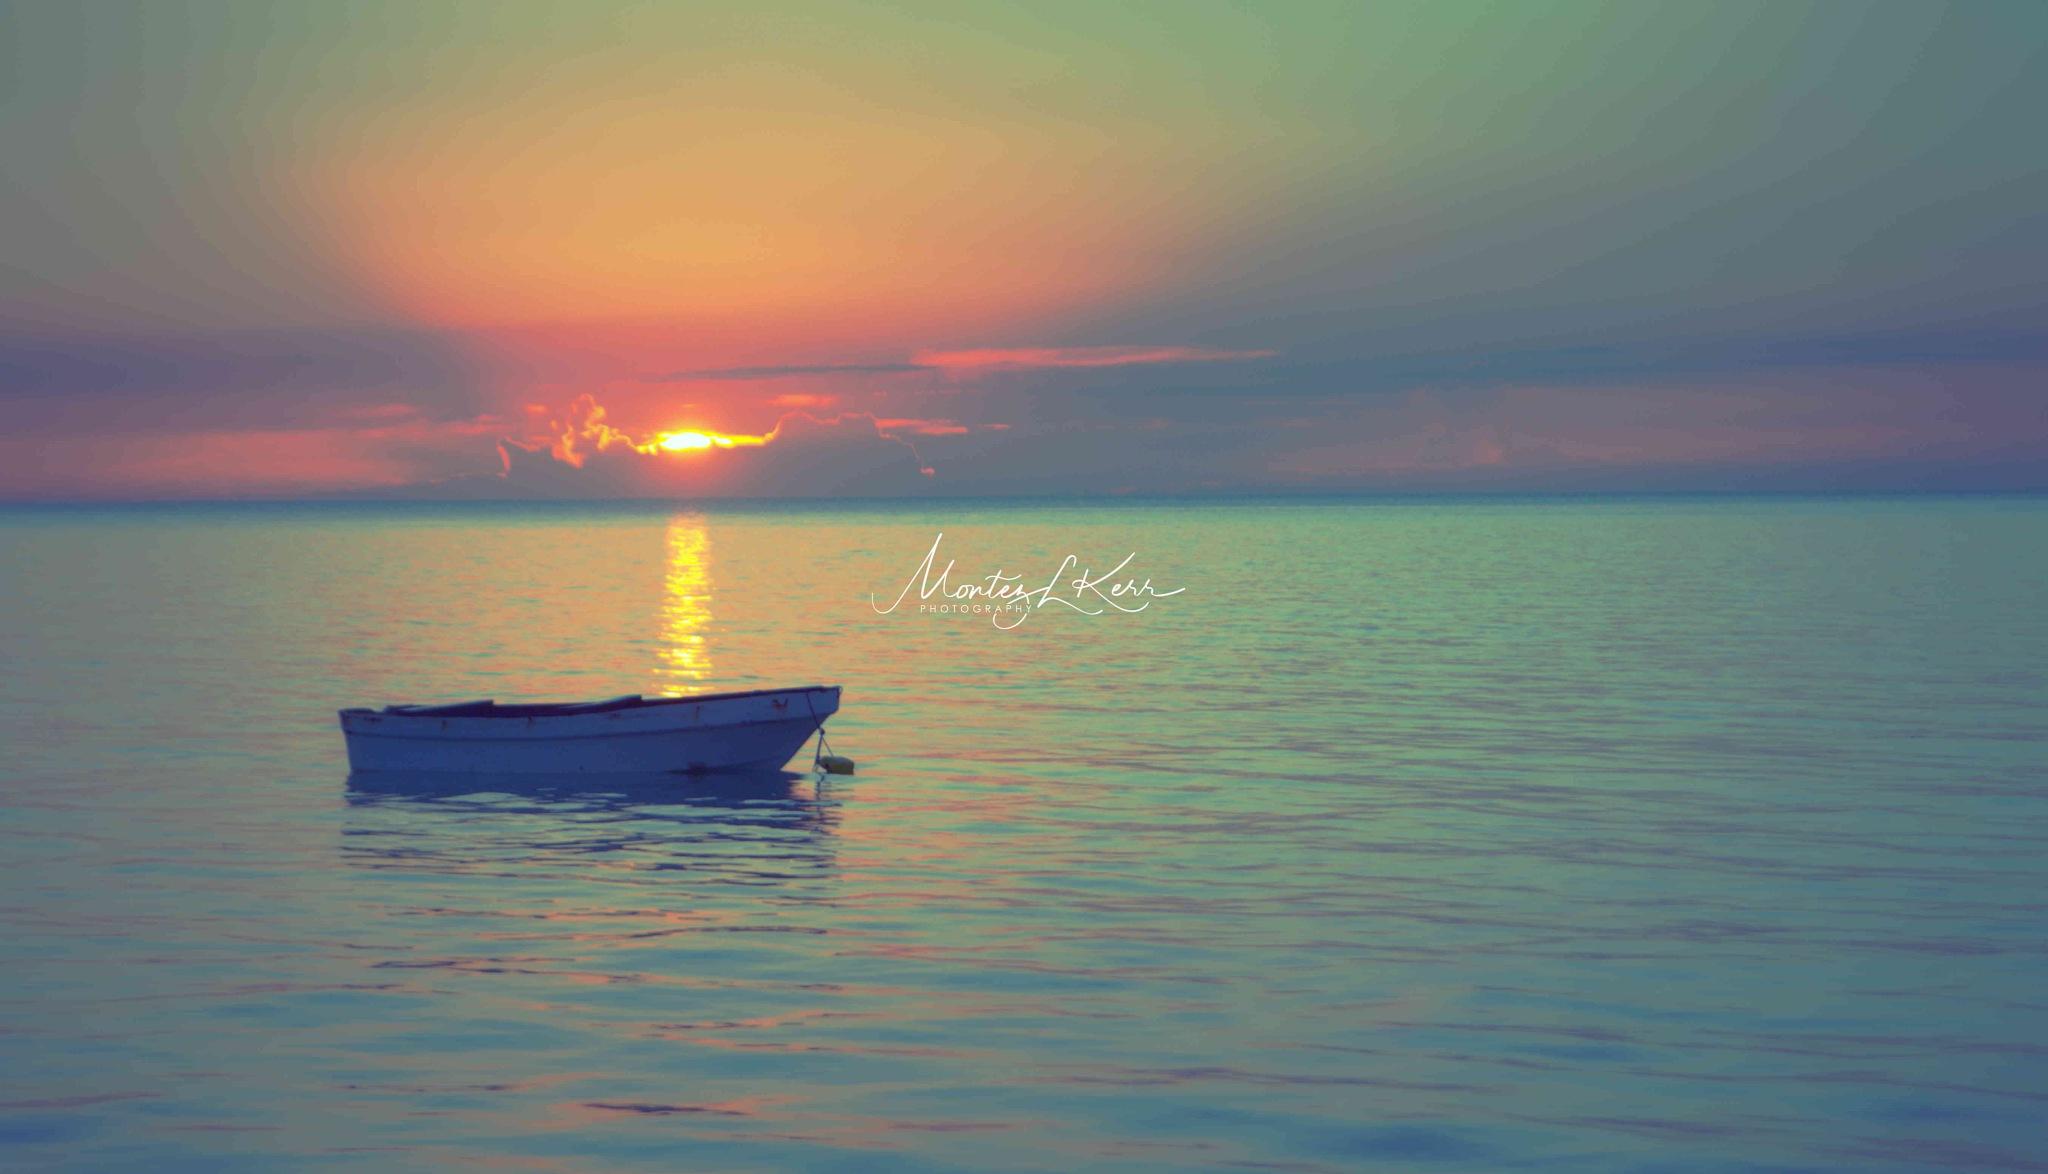 Morning Rise by Montez Kerr